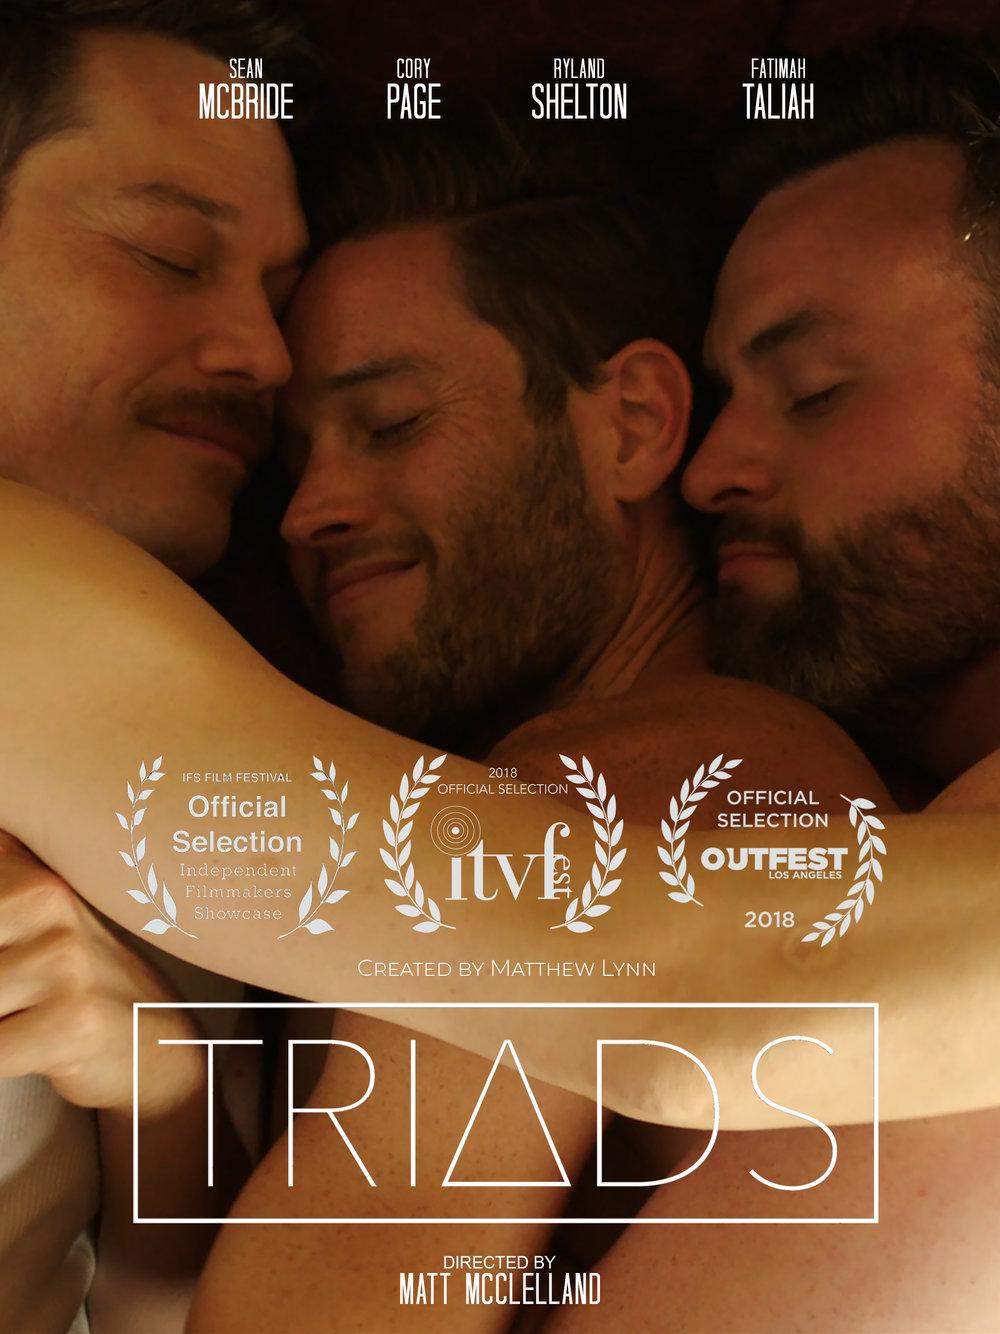 TRIADS Poster FINAL.jpg